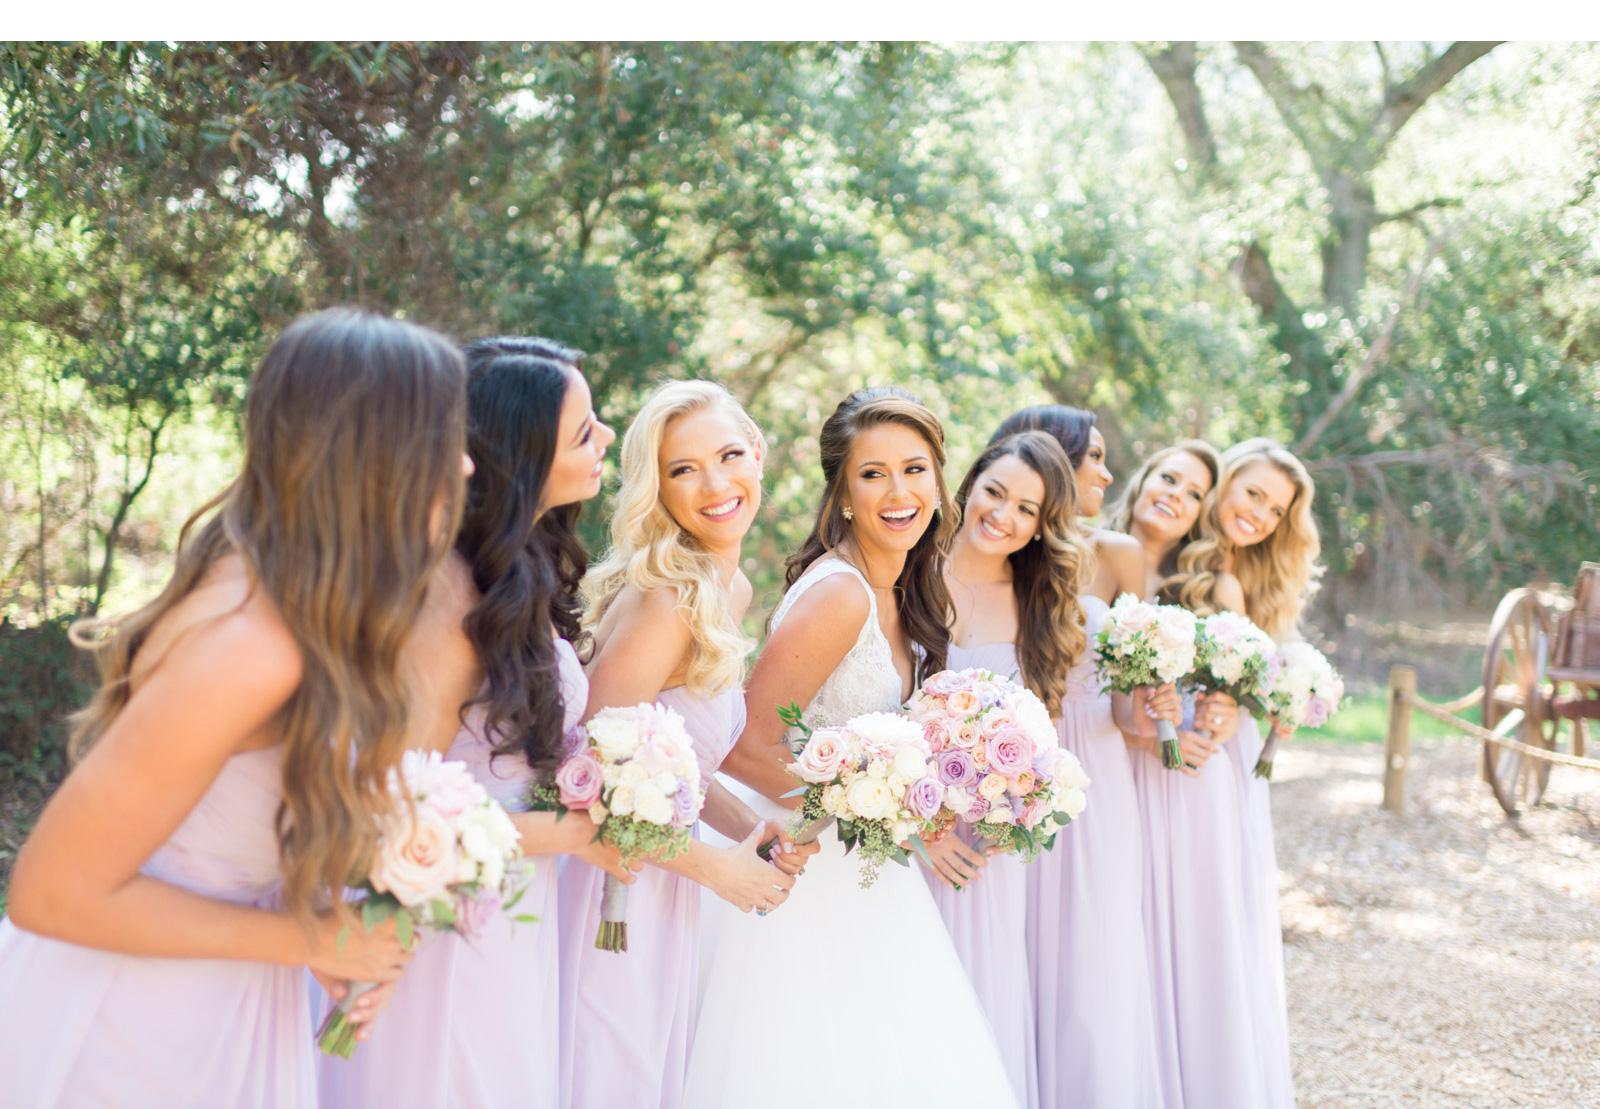 Miss-USA-Temecula-Wedding-Natalie-Schutt-Photography_07.jpg